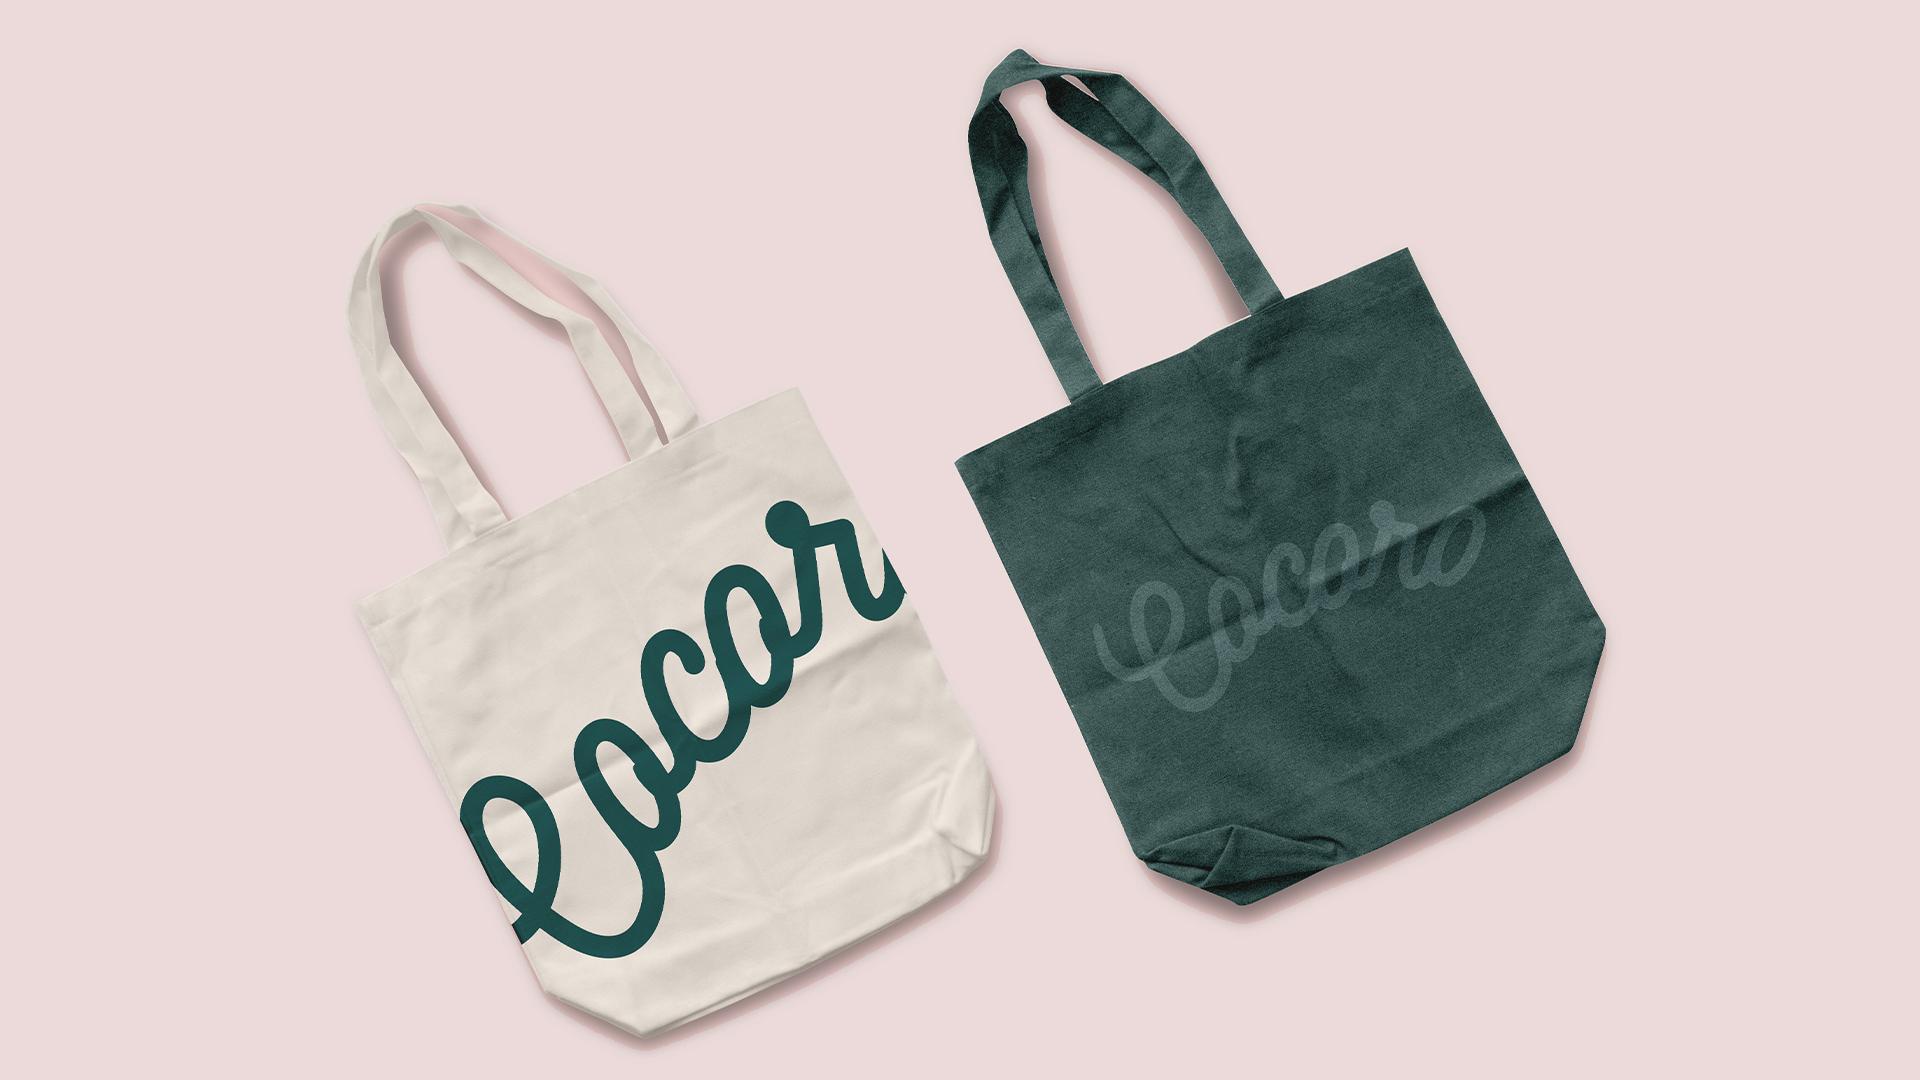 cocoro咖啡厅品牌包装设计-布袋设计